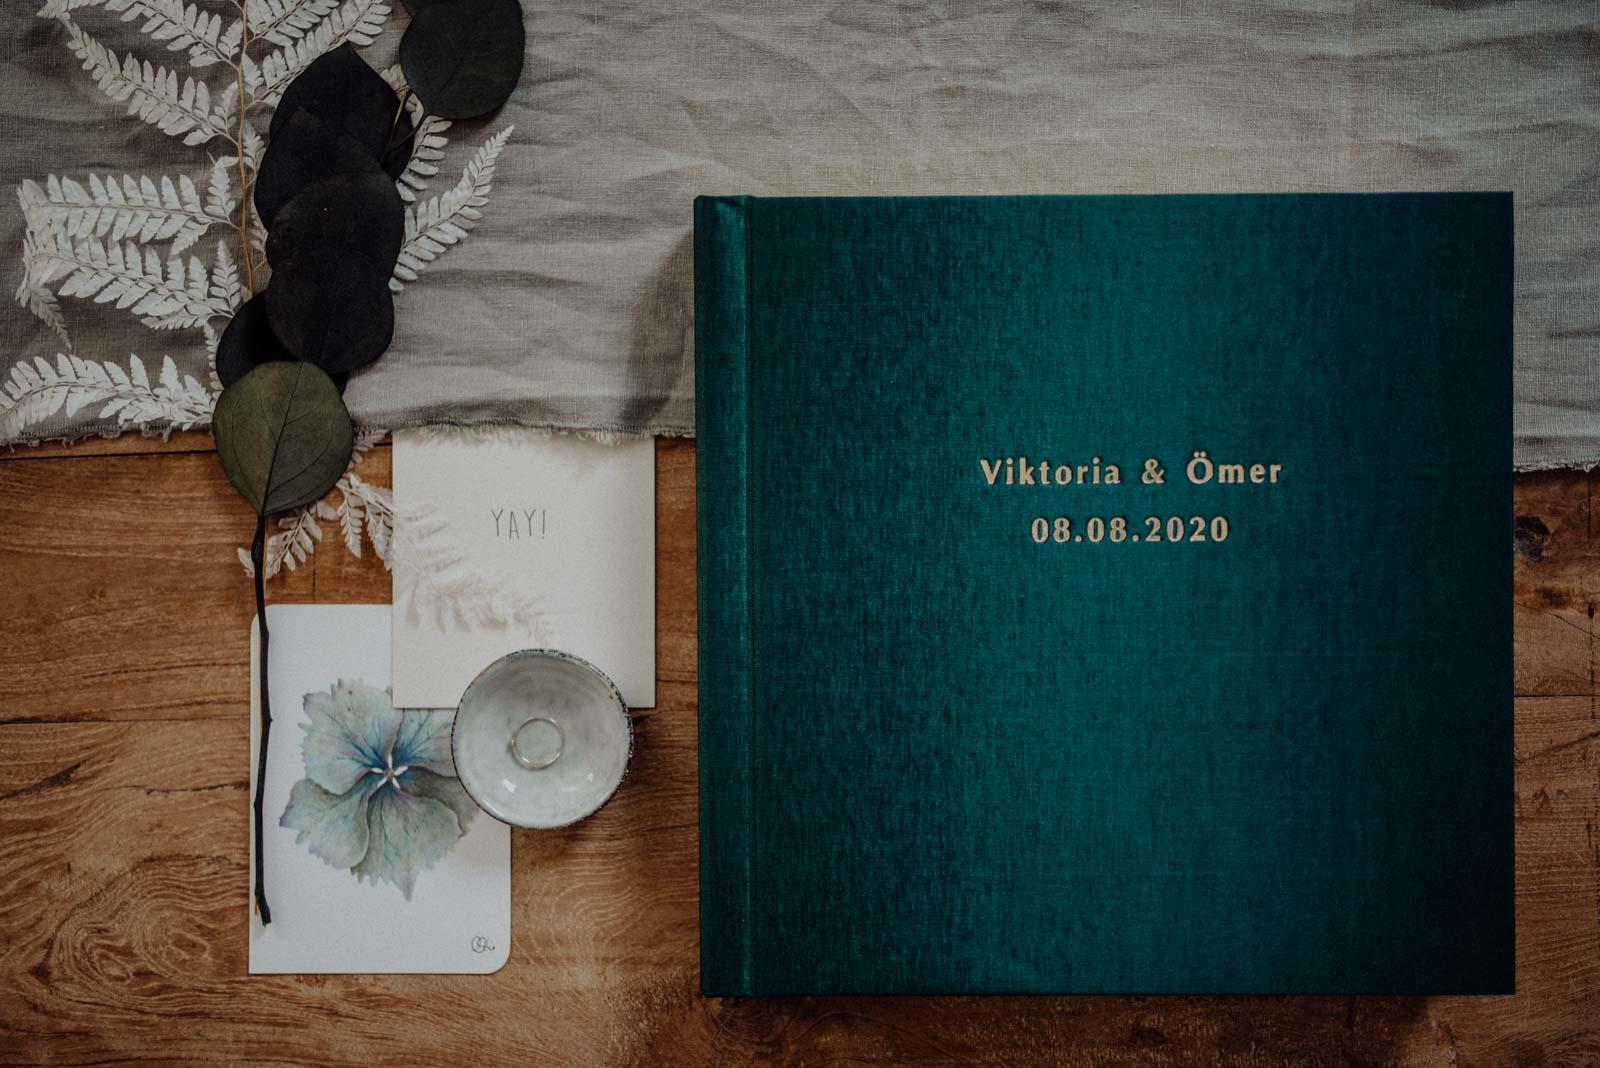 046-Fotoalbum-Fotobuch-Premium-Fotograf-Witten-Luxus